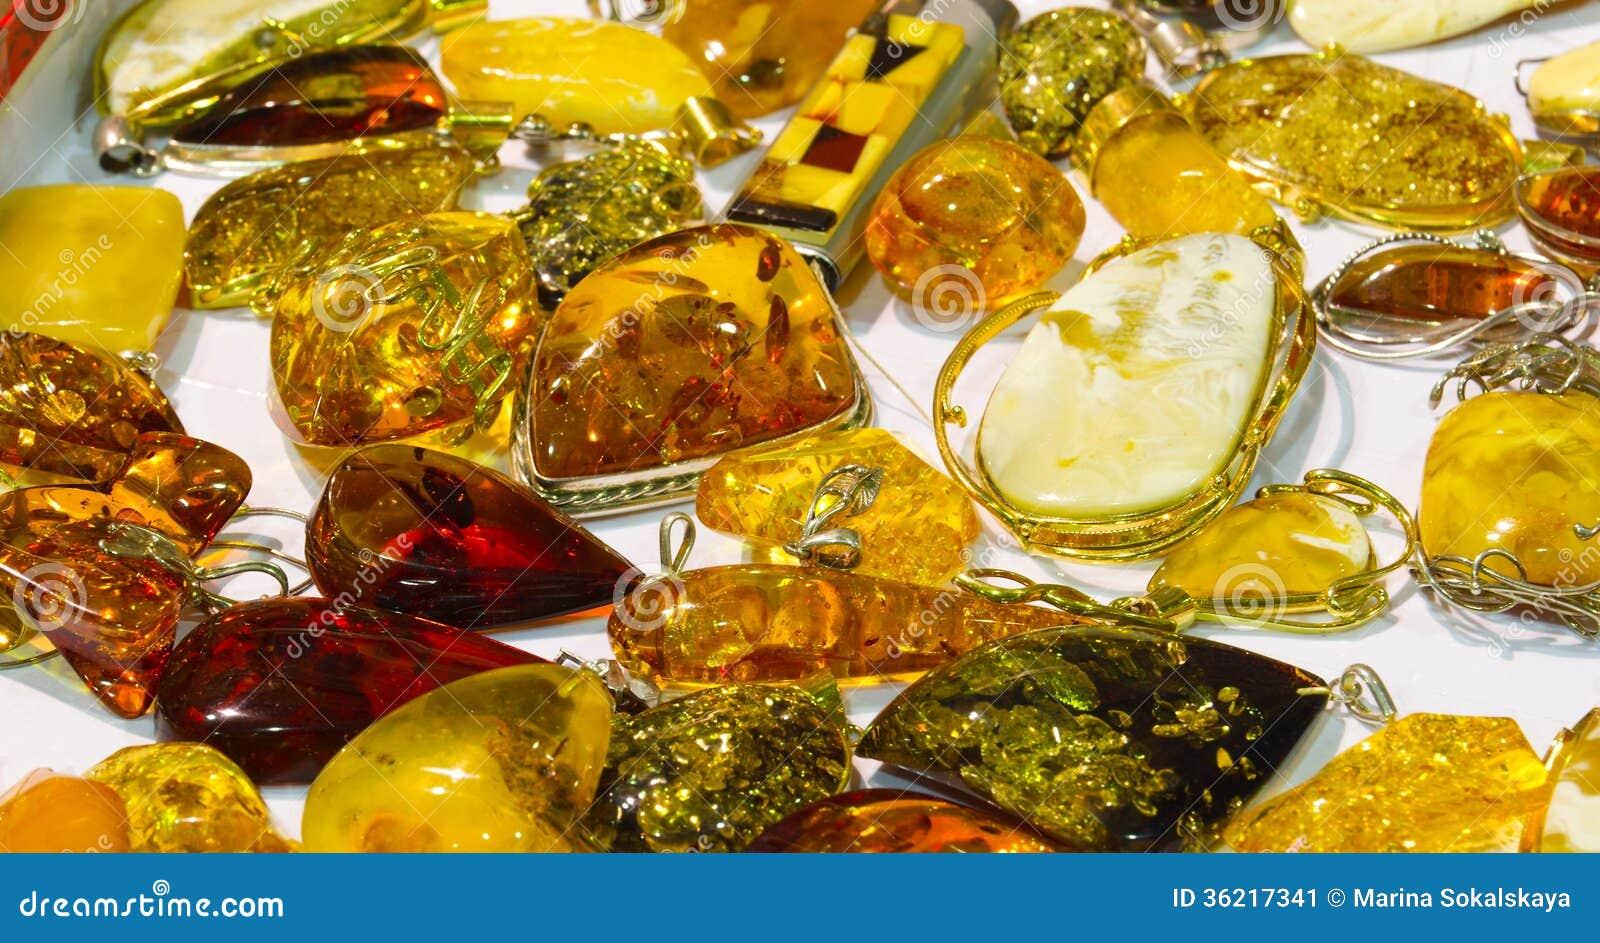 Handmade amber pendants stock image image of present 36217341 download comp aloadofball Images